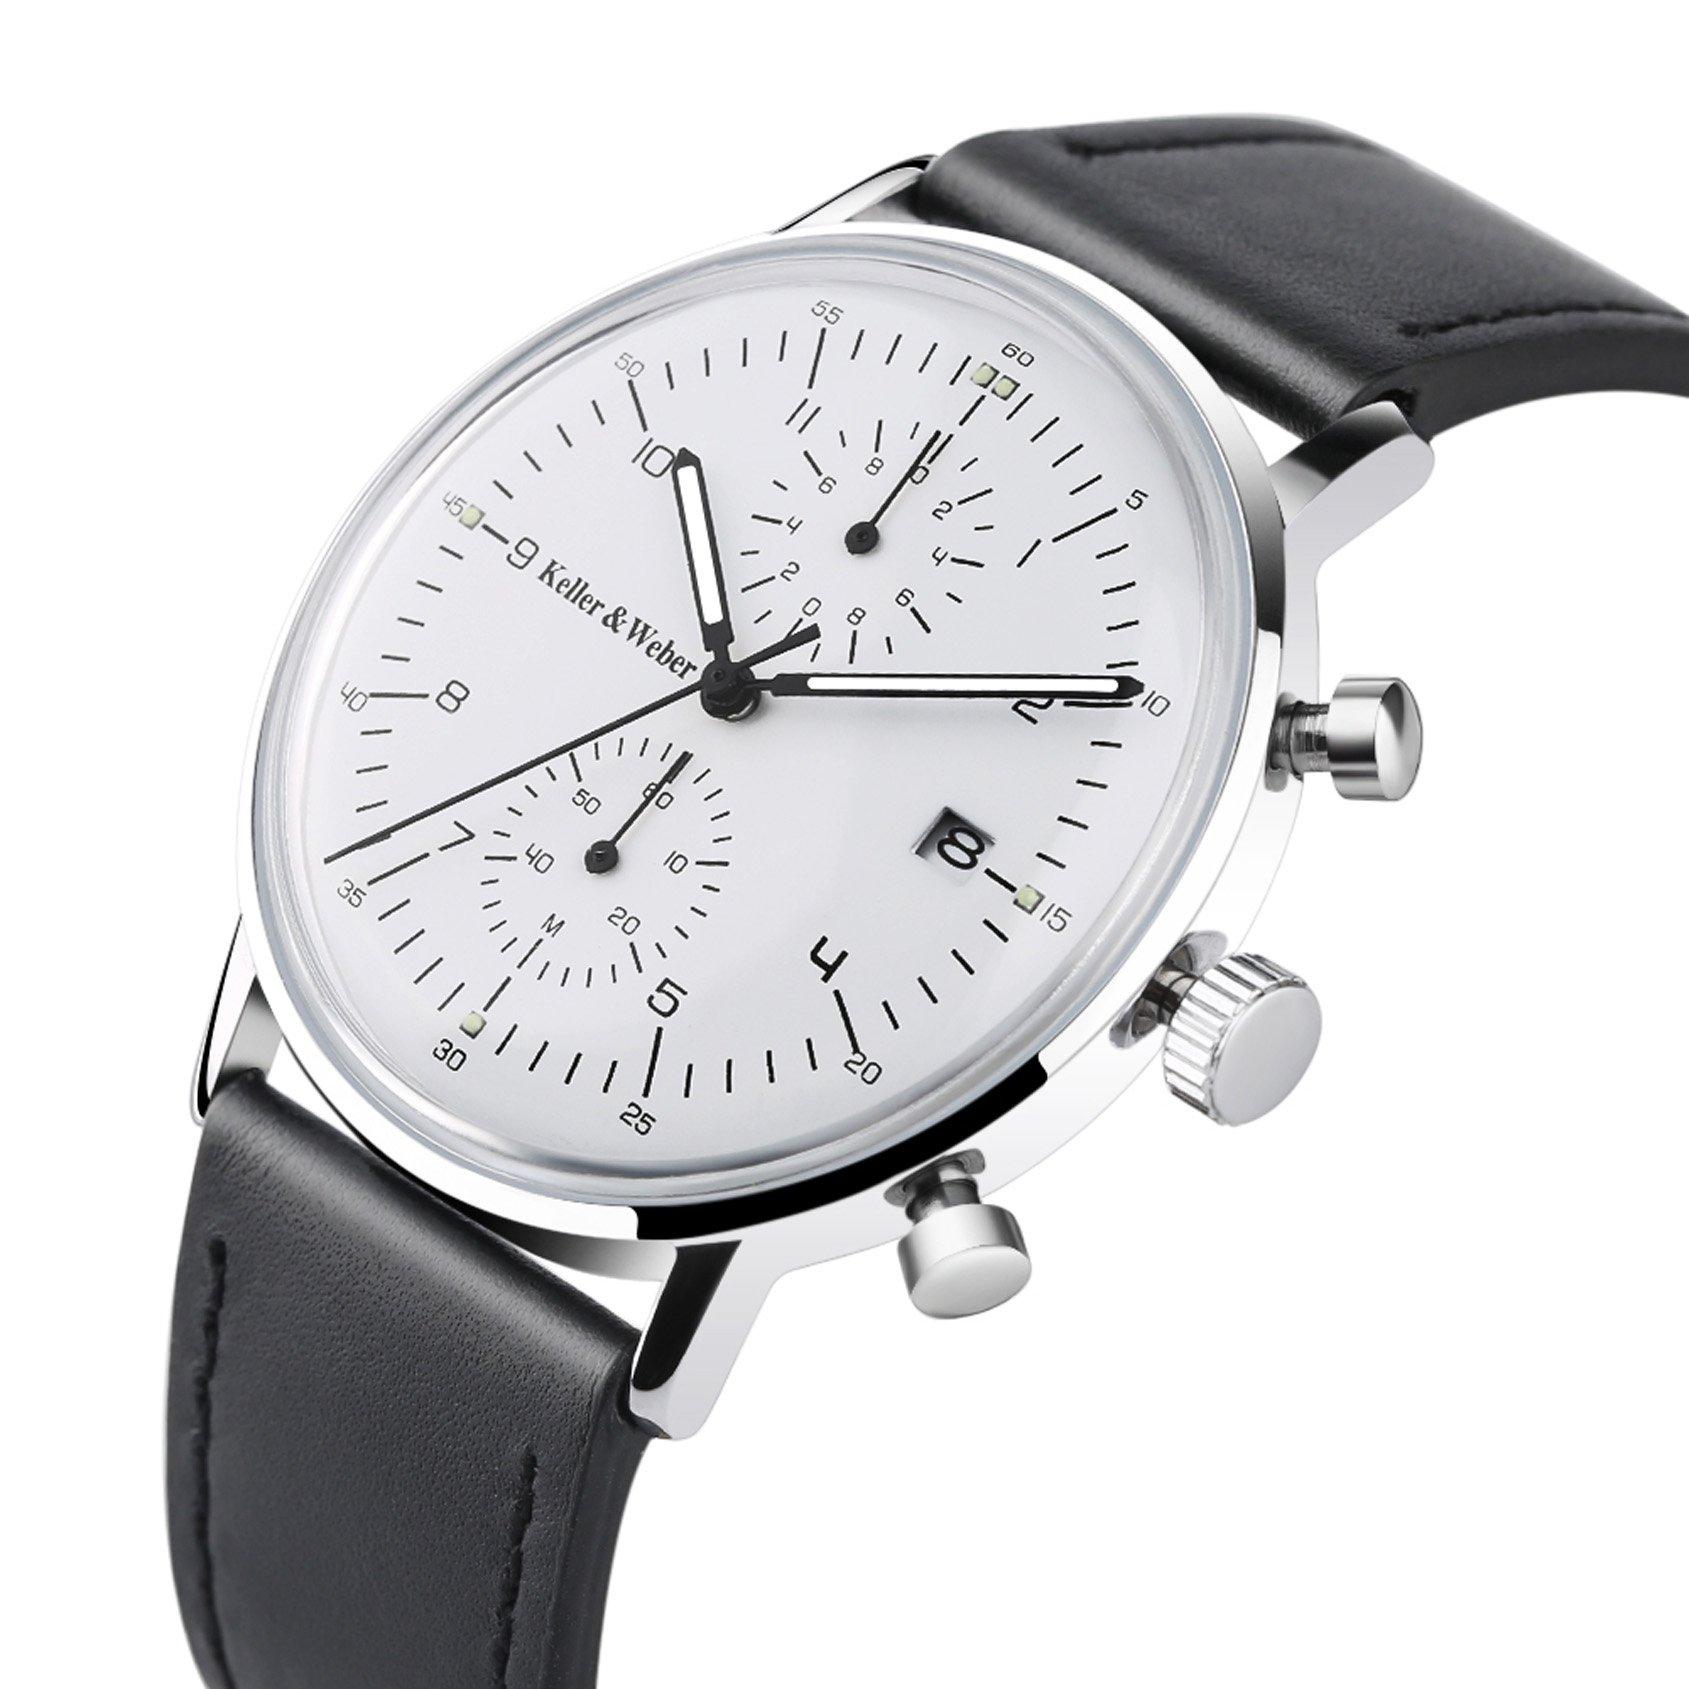 Keller & Weber Quartz Men Watches Sports Chronograph Waterproof Genuine Leather Band Business Wristwatch by Keller & Weber